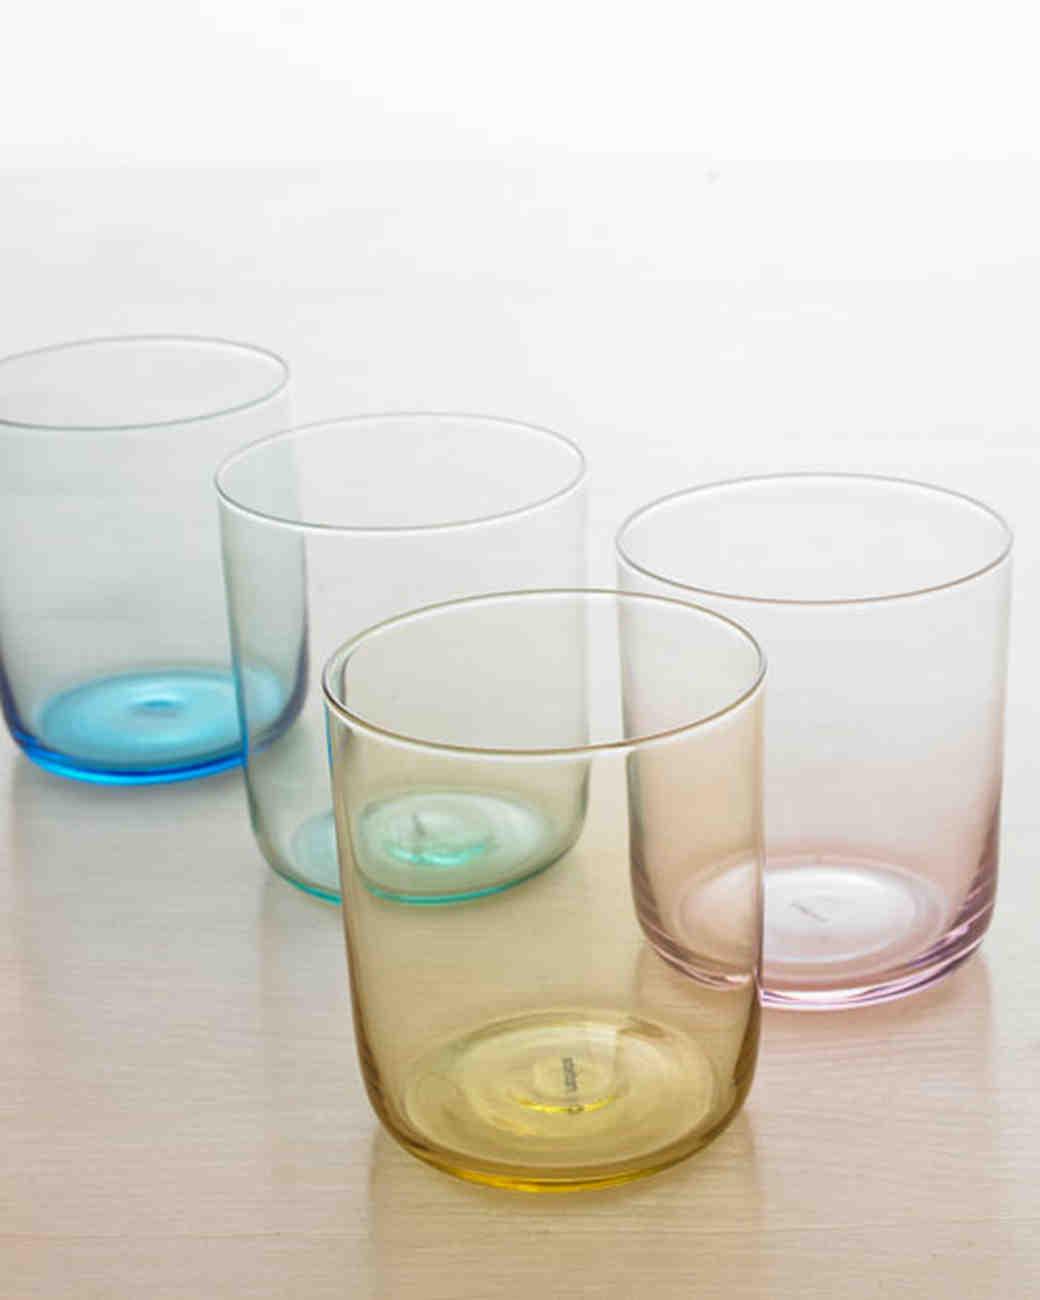 ld106509_spr11_glasscup4steltonsimplyglass.jpg